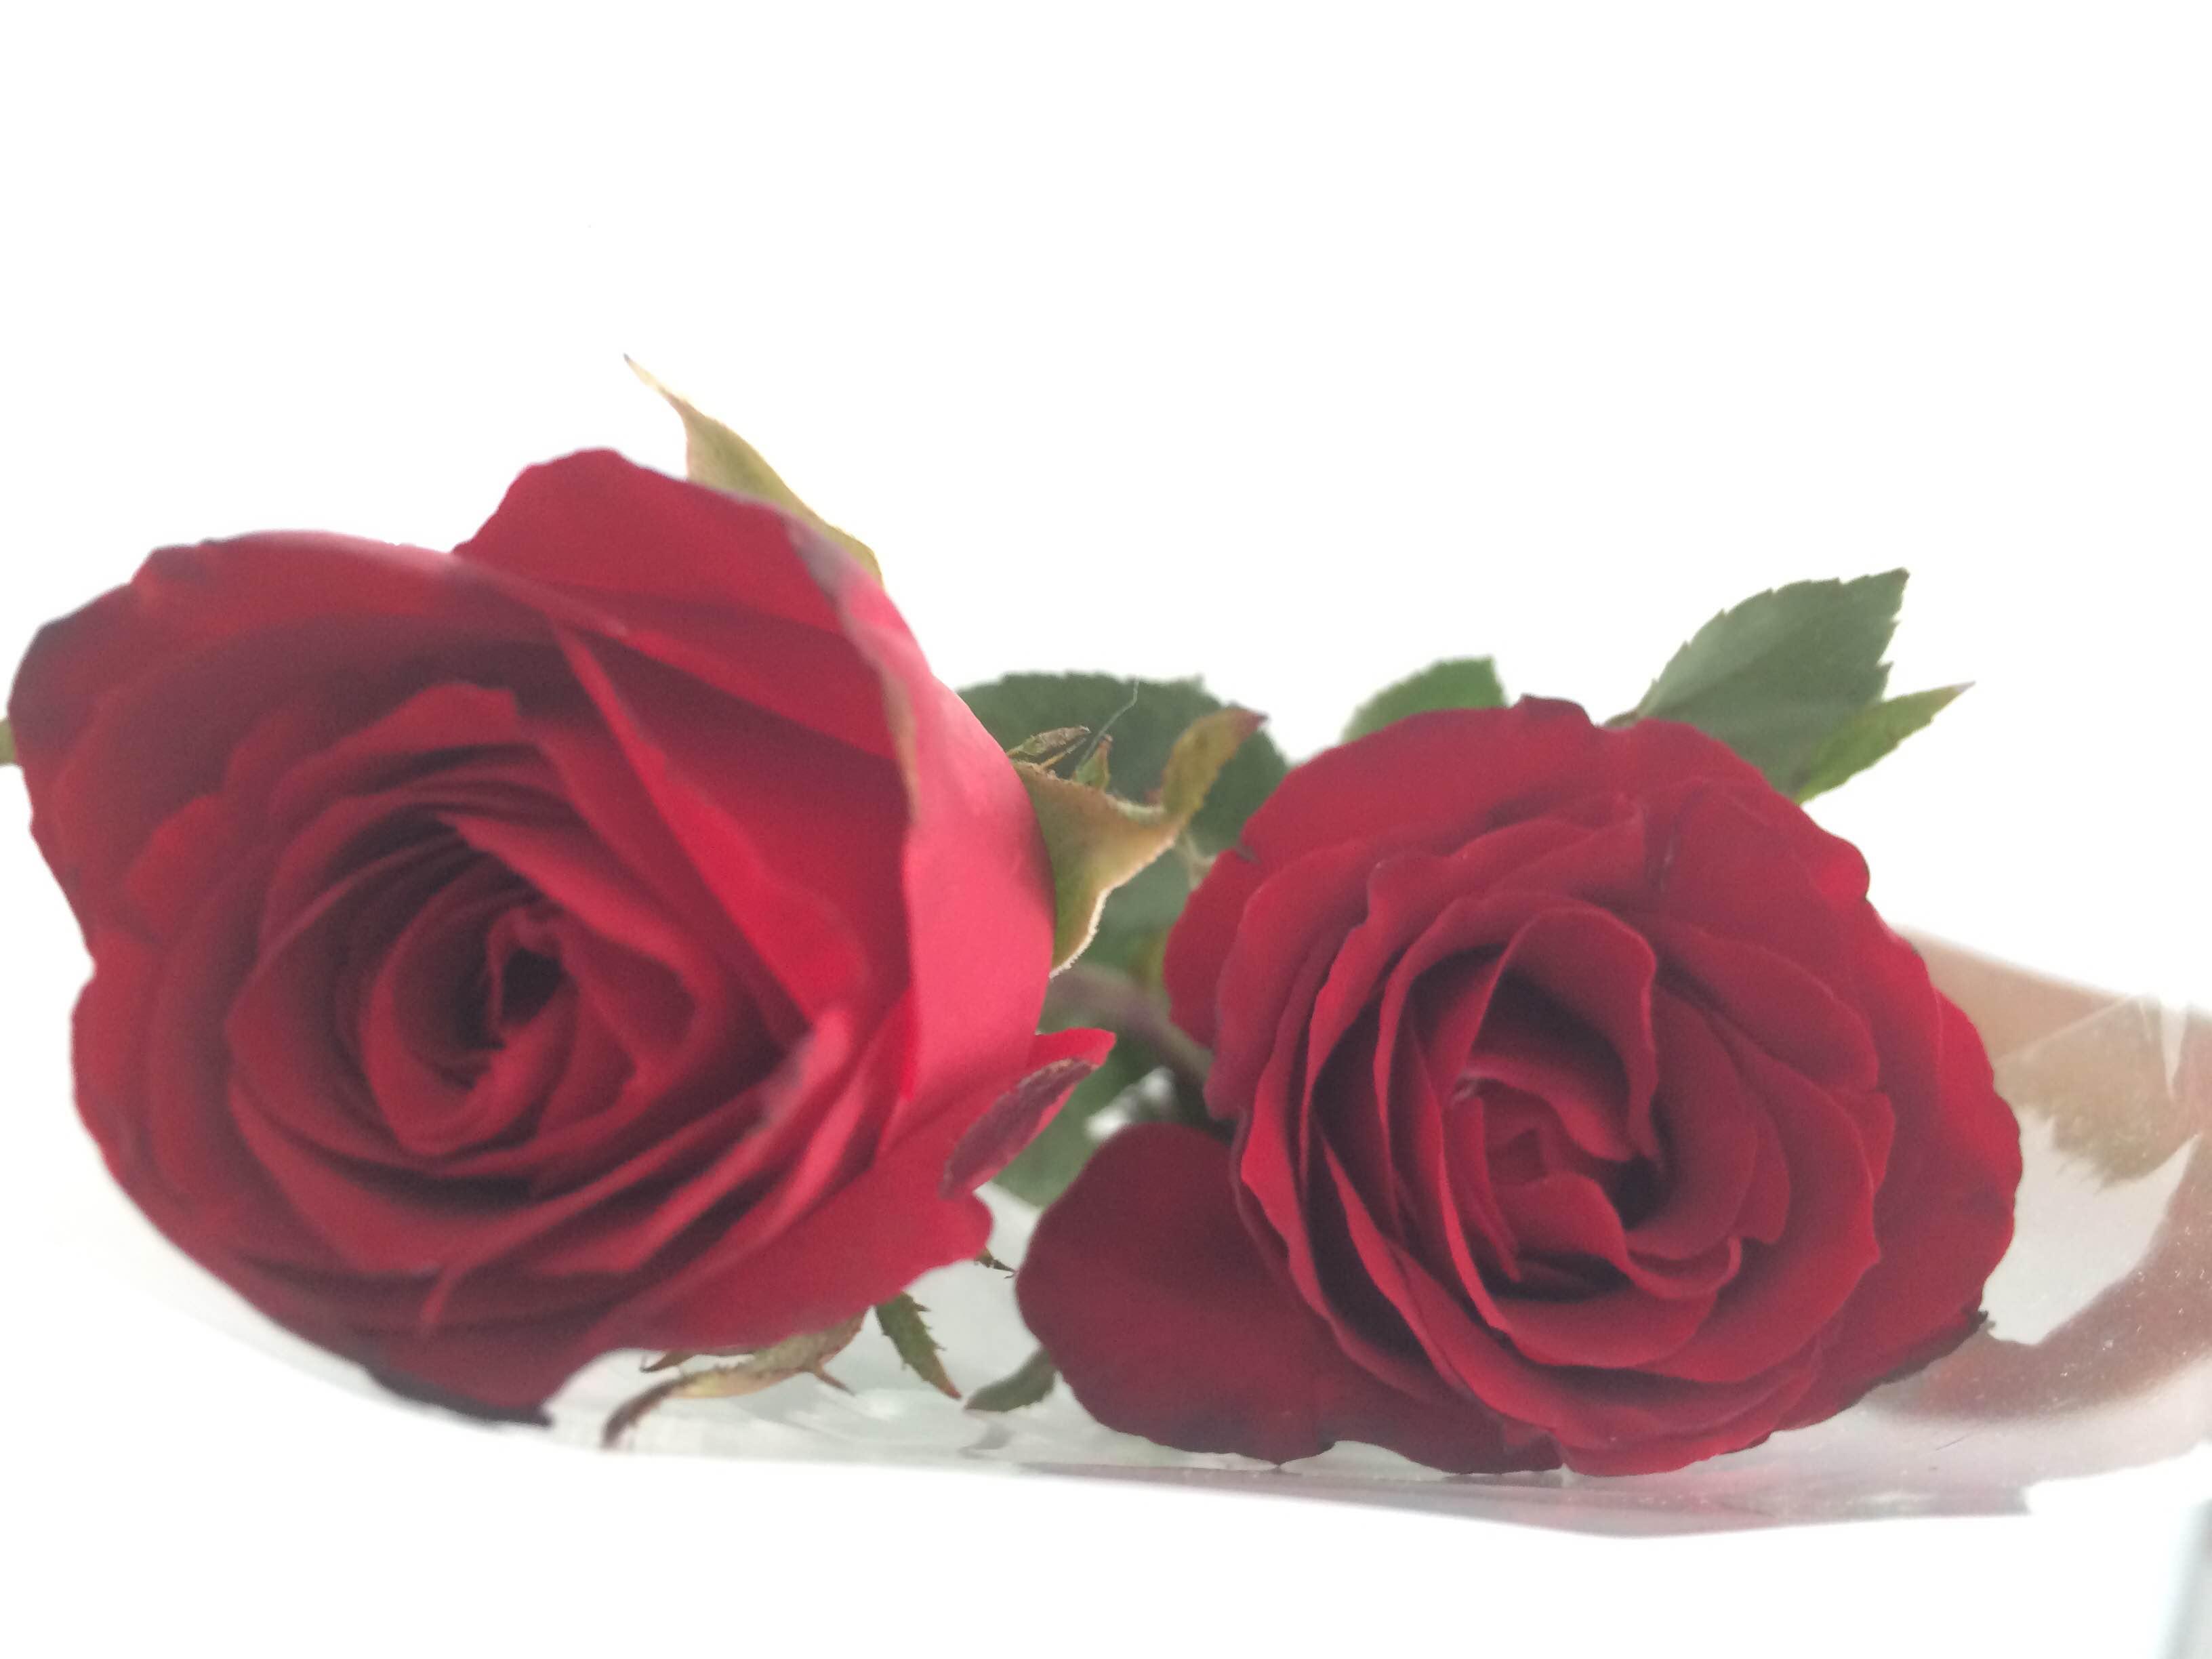 Anak muda masa kini pakai bunga untuk ekspresi cinta, kamu bagaimana?